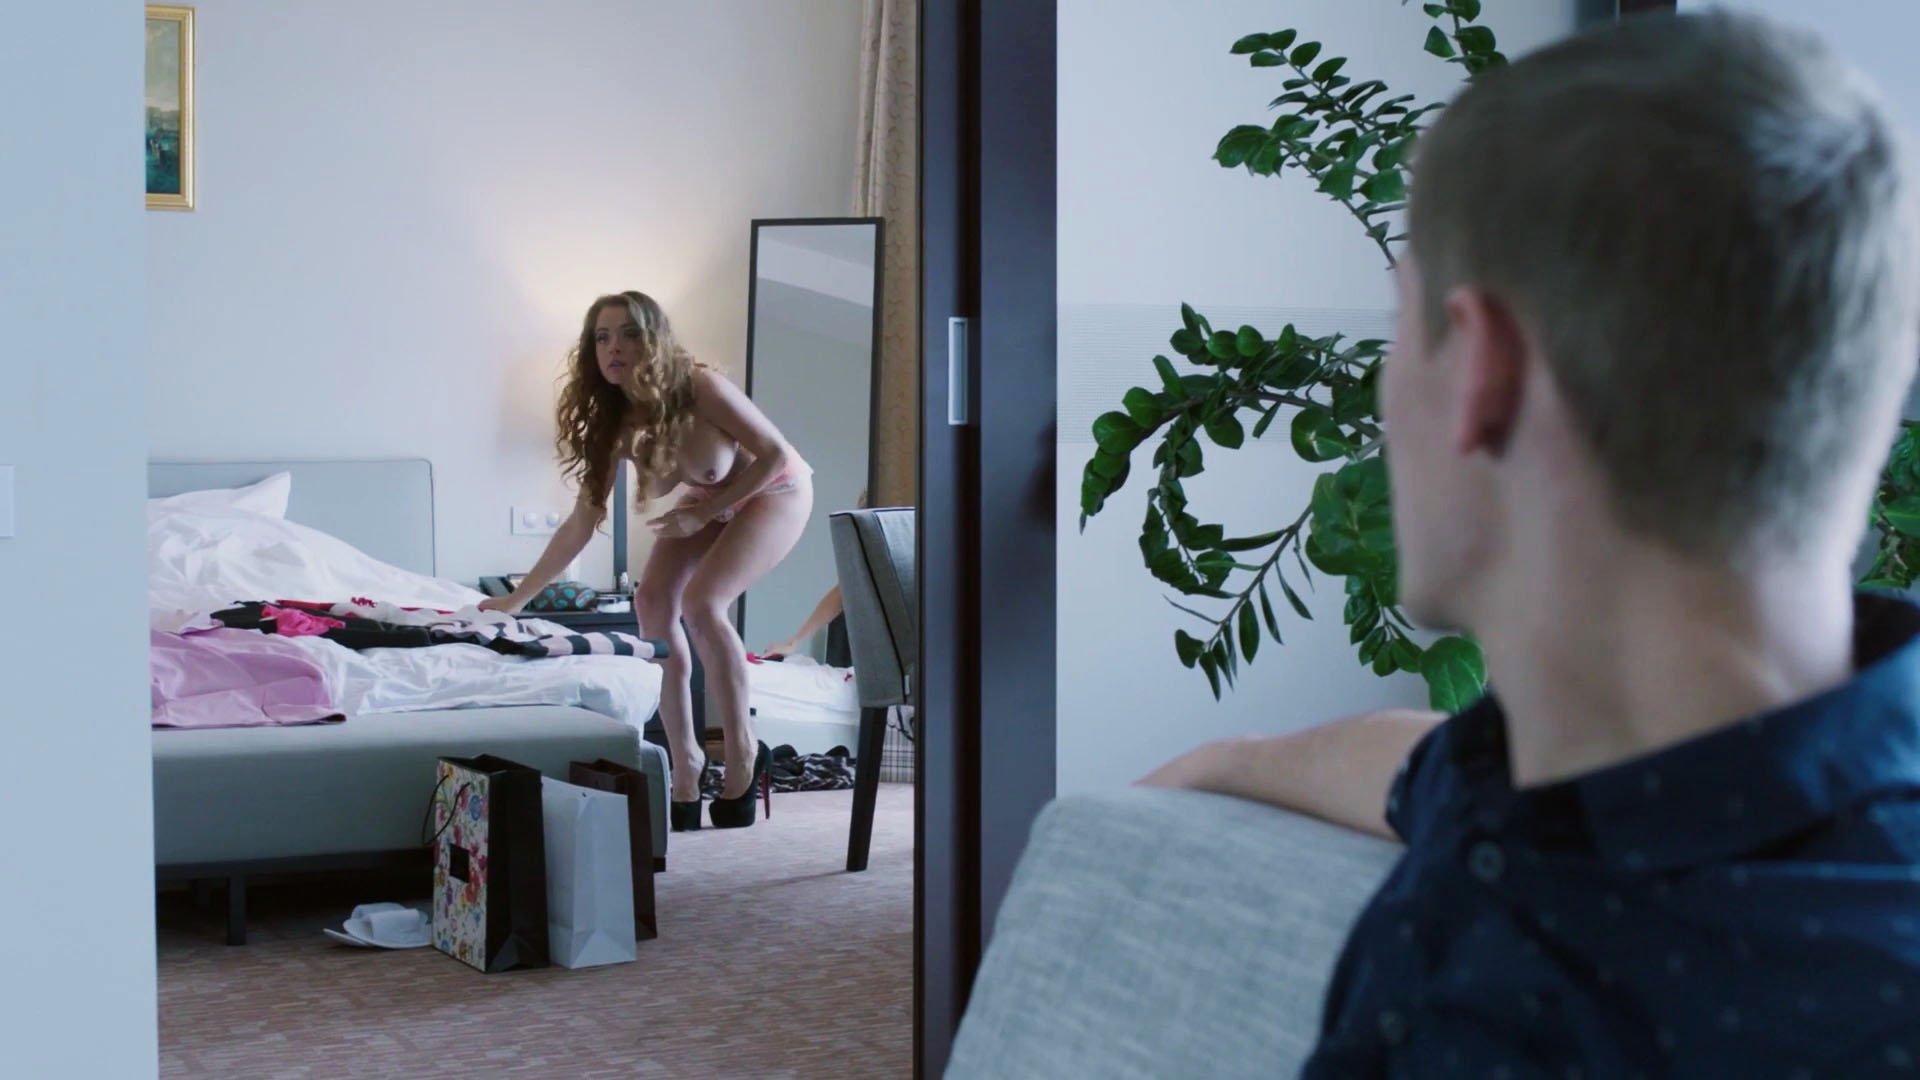 Екатерина кабак фото голая, женский эротический квартет